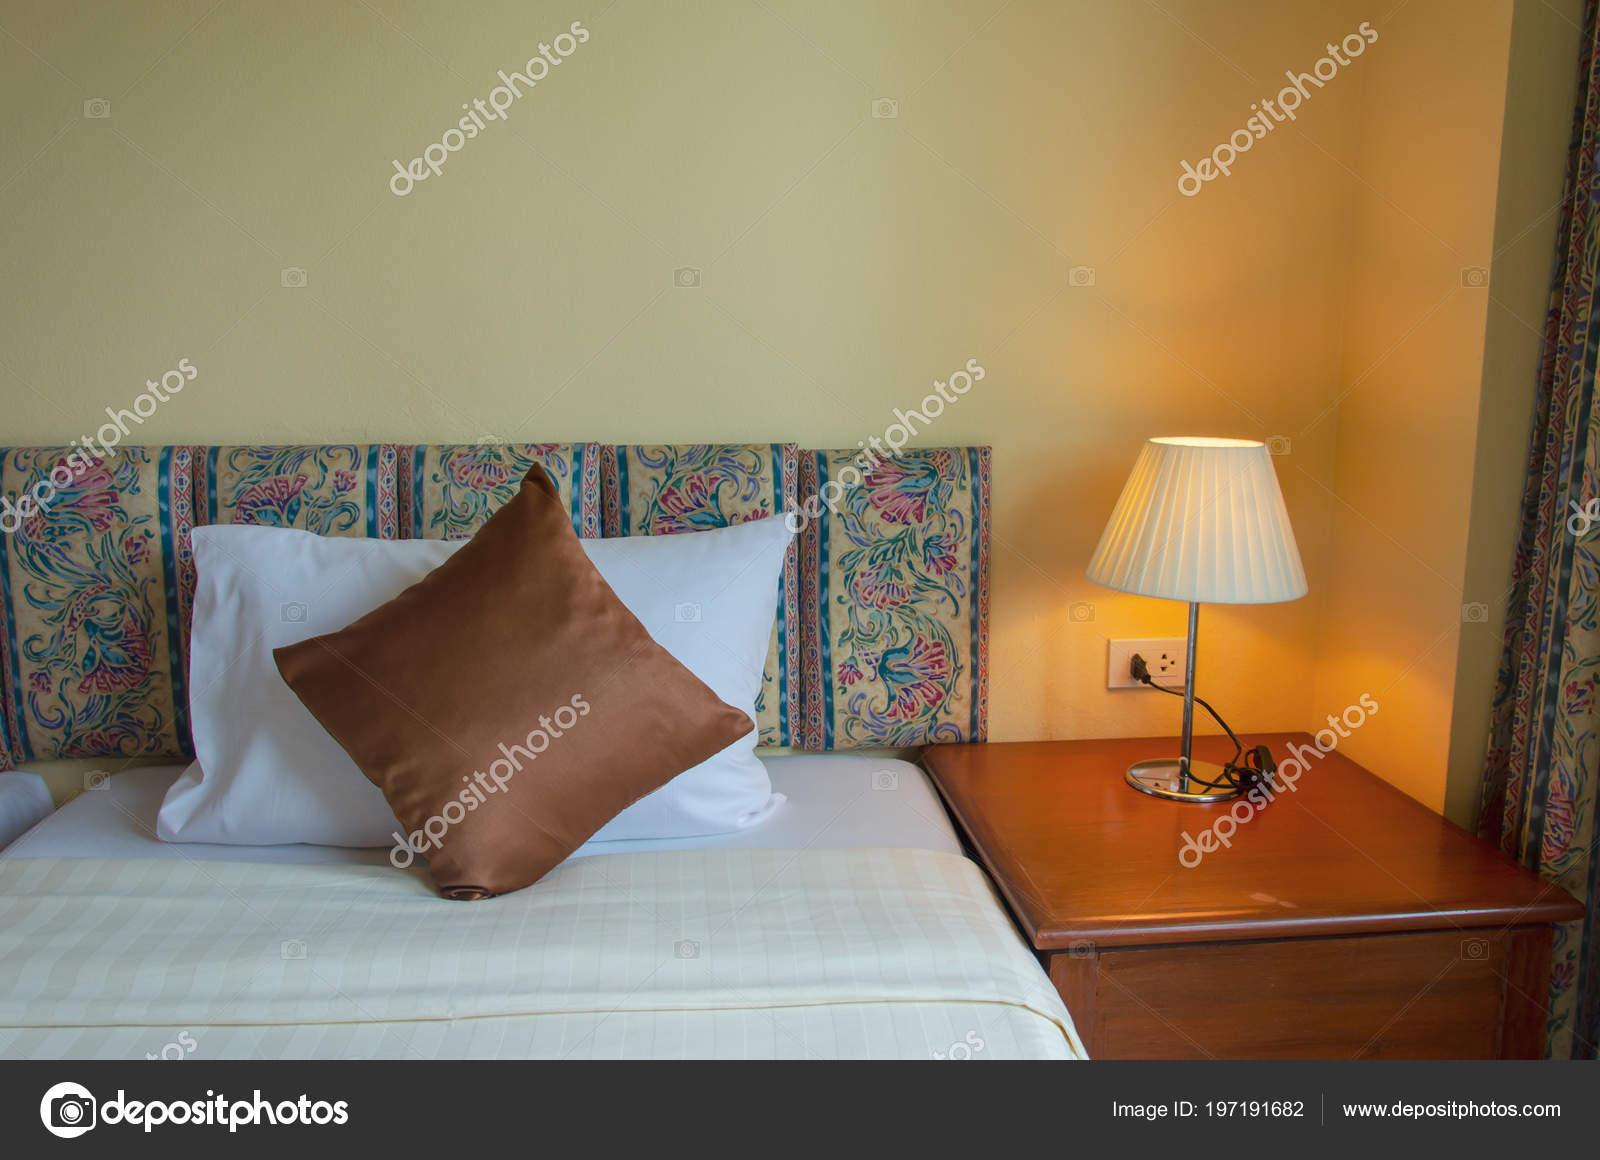 lampen schlafzimmer modern schlafzimmer deko kissen set massivholz g nstig kinderzimmer im. Black Bedroom Furniture Sets. Home Design Ideas